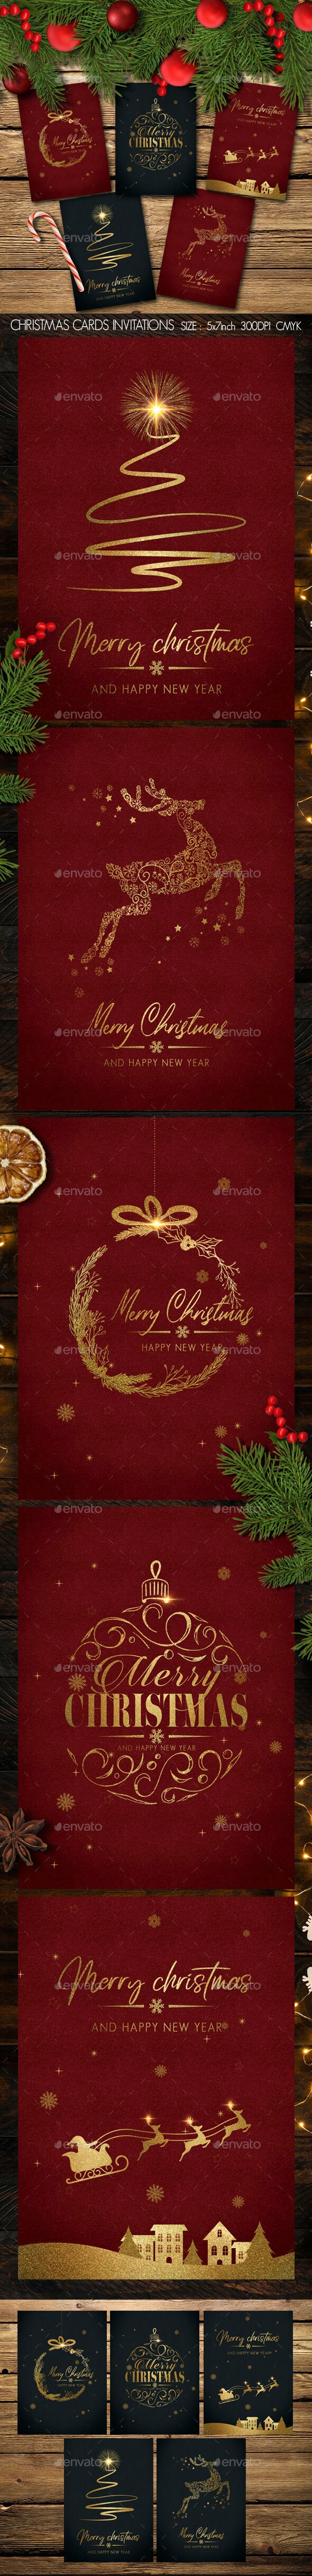 Christmas Cards Invitations - Christmas Greeting Cards